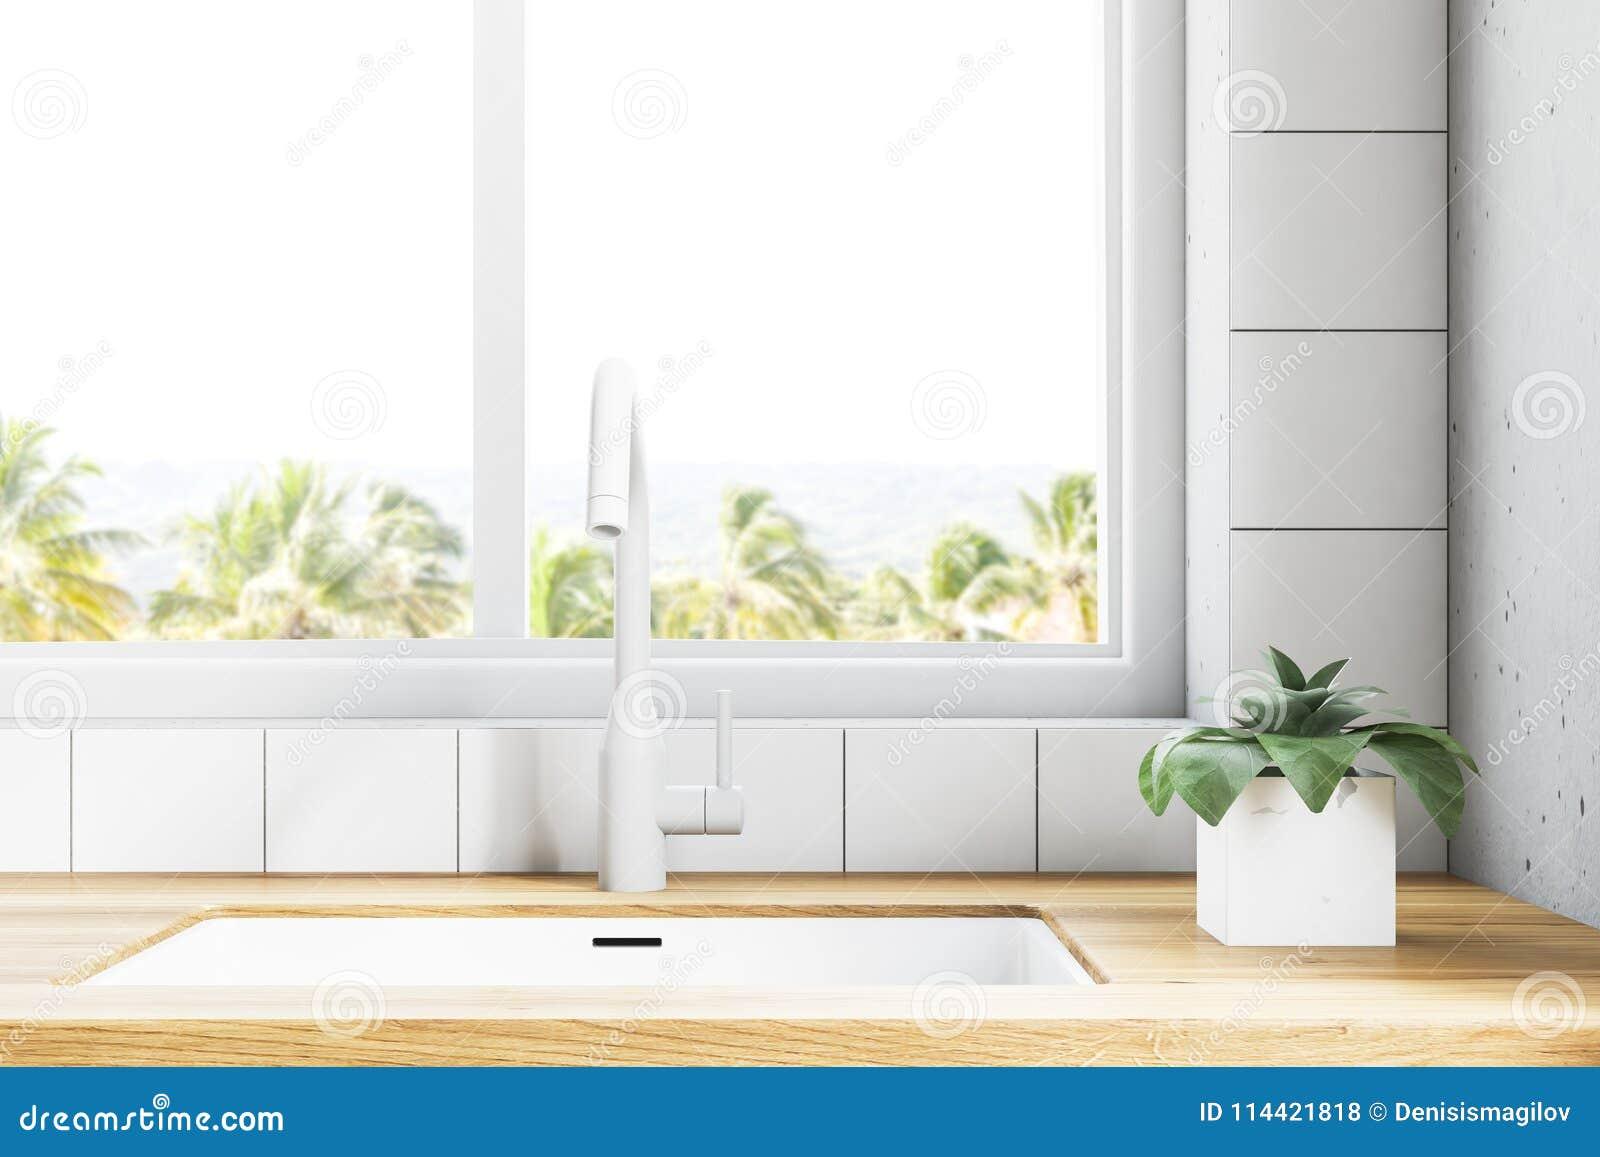 kitchen counter window horizontal white kitchen sink near window with tropic view kitchen sink near window with tropic view stock illustration